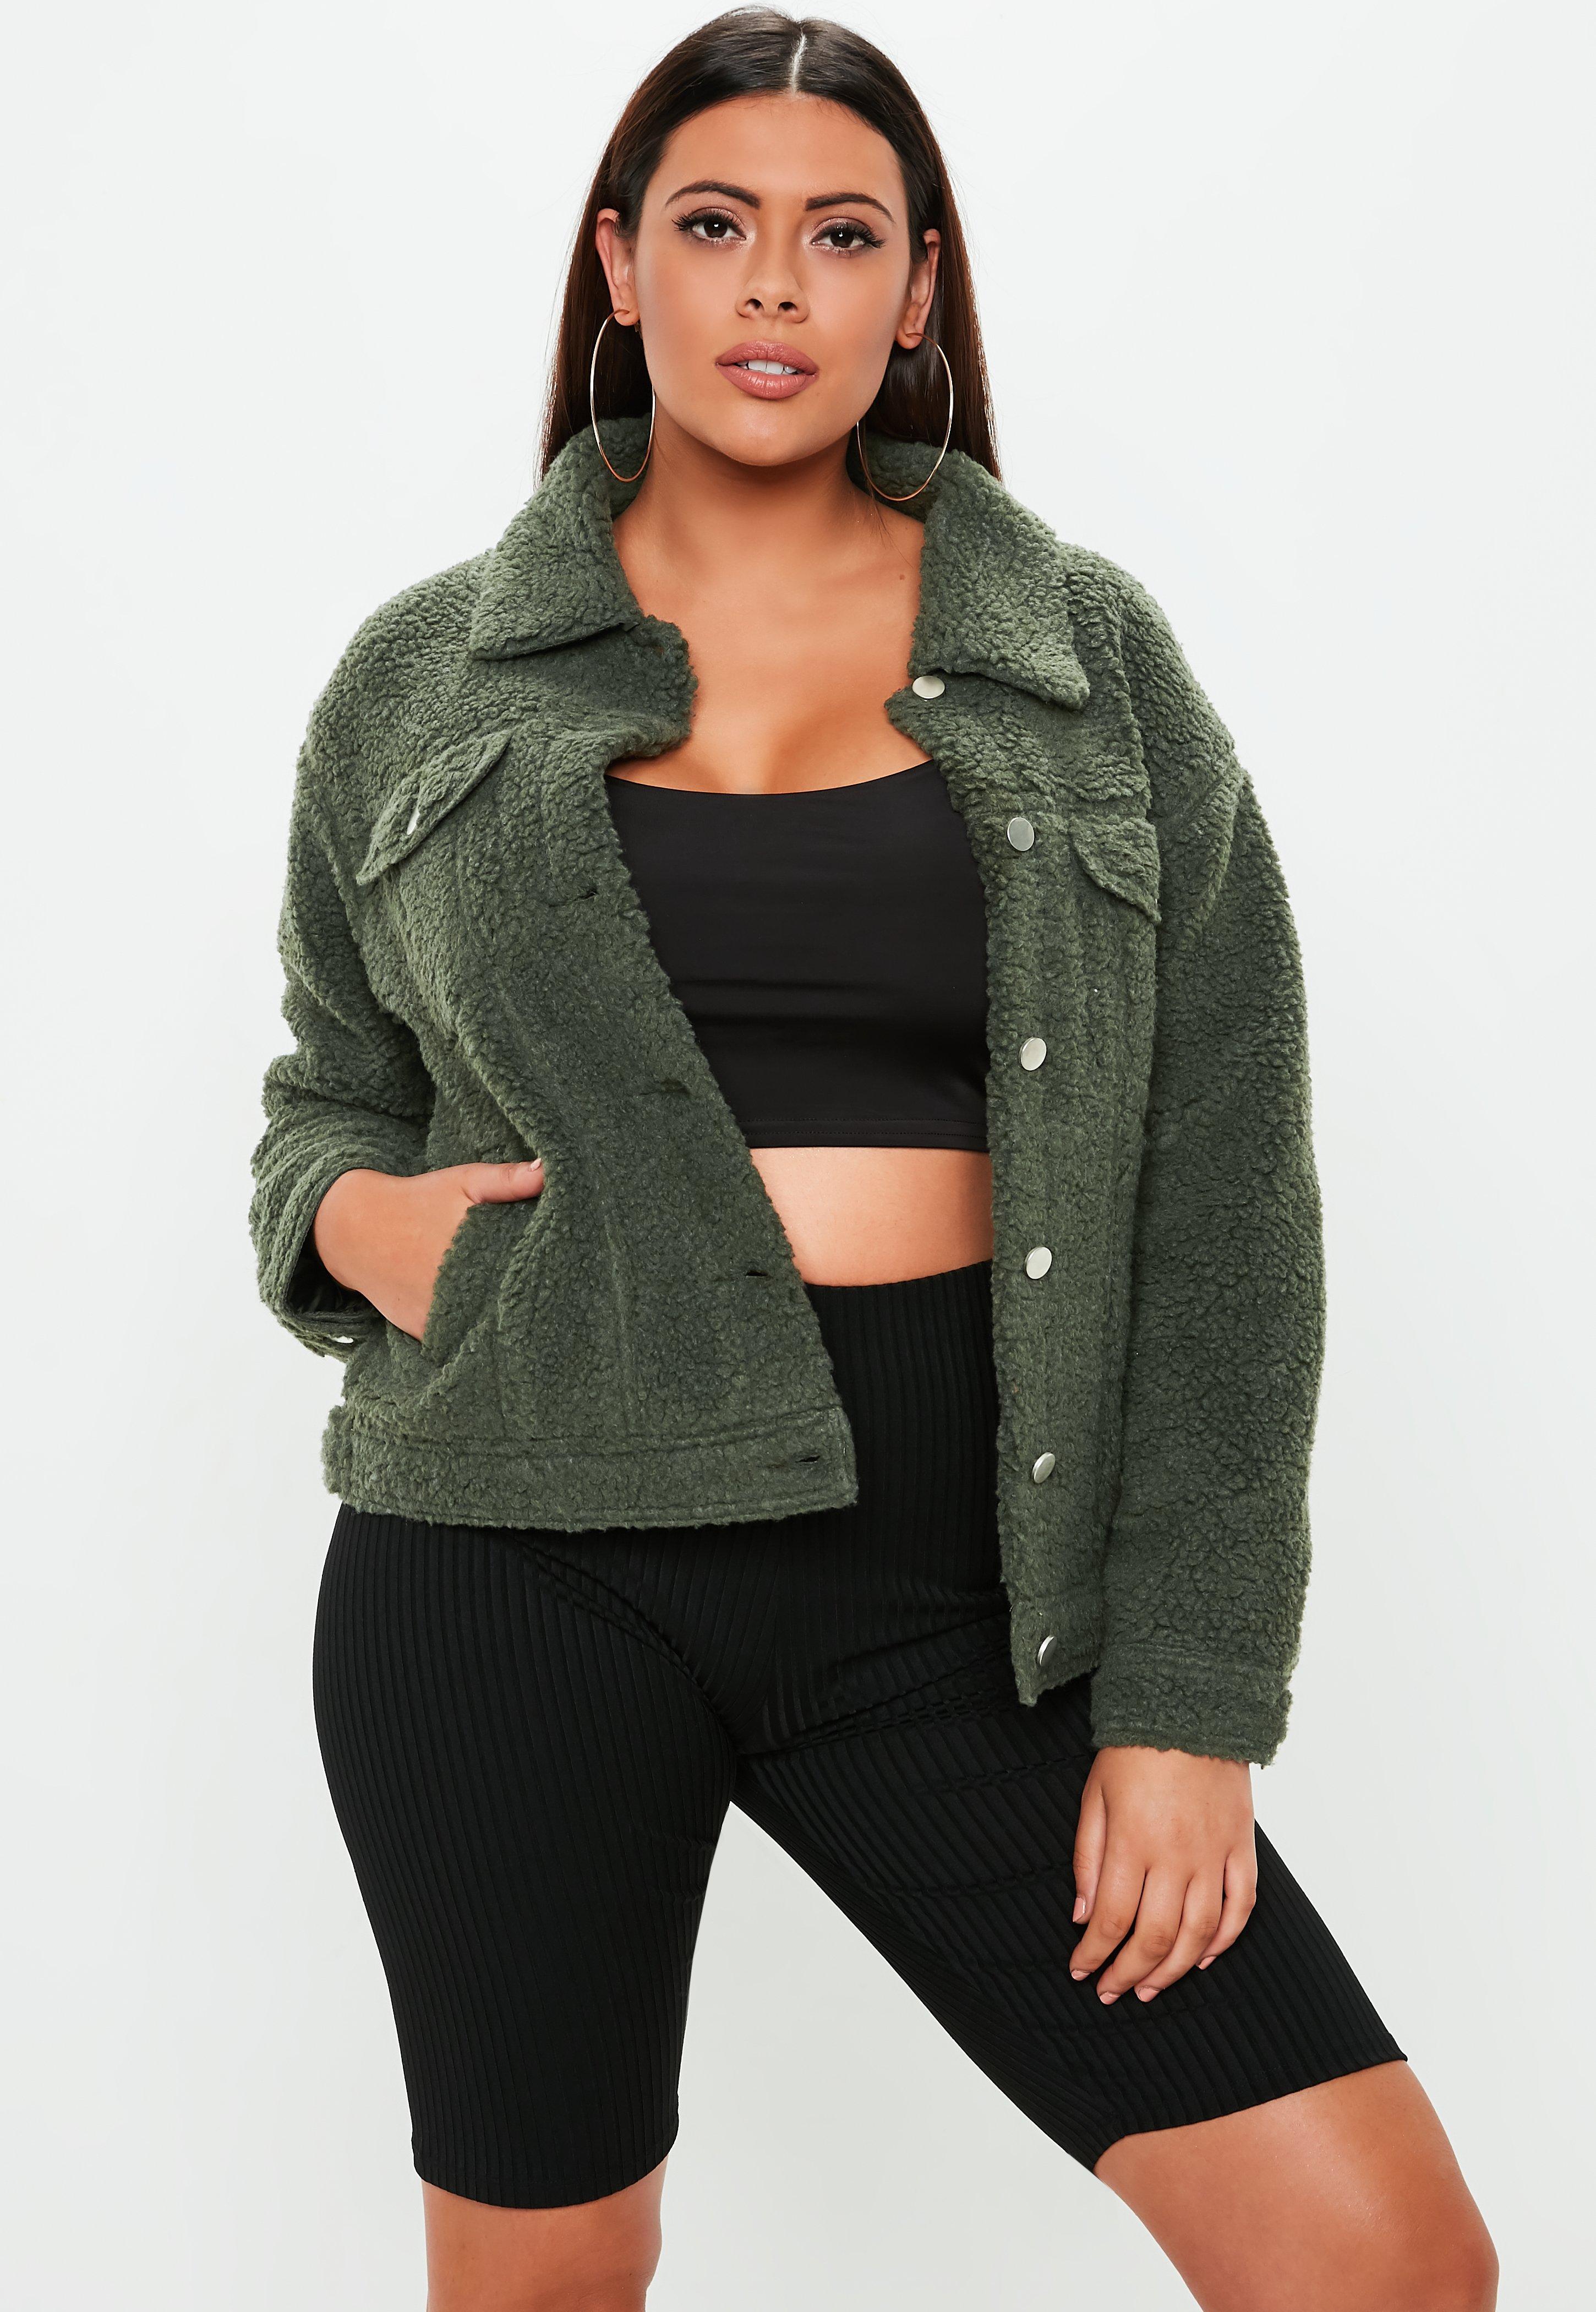 7c3a7ced33 Plus Size Coats | Plus Size Winter Coats & Jackets - Missguided